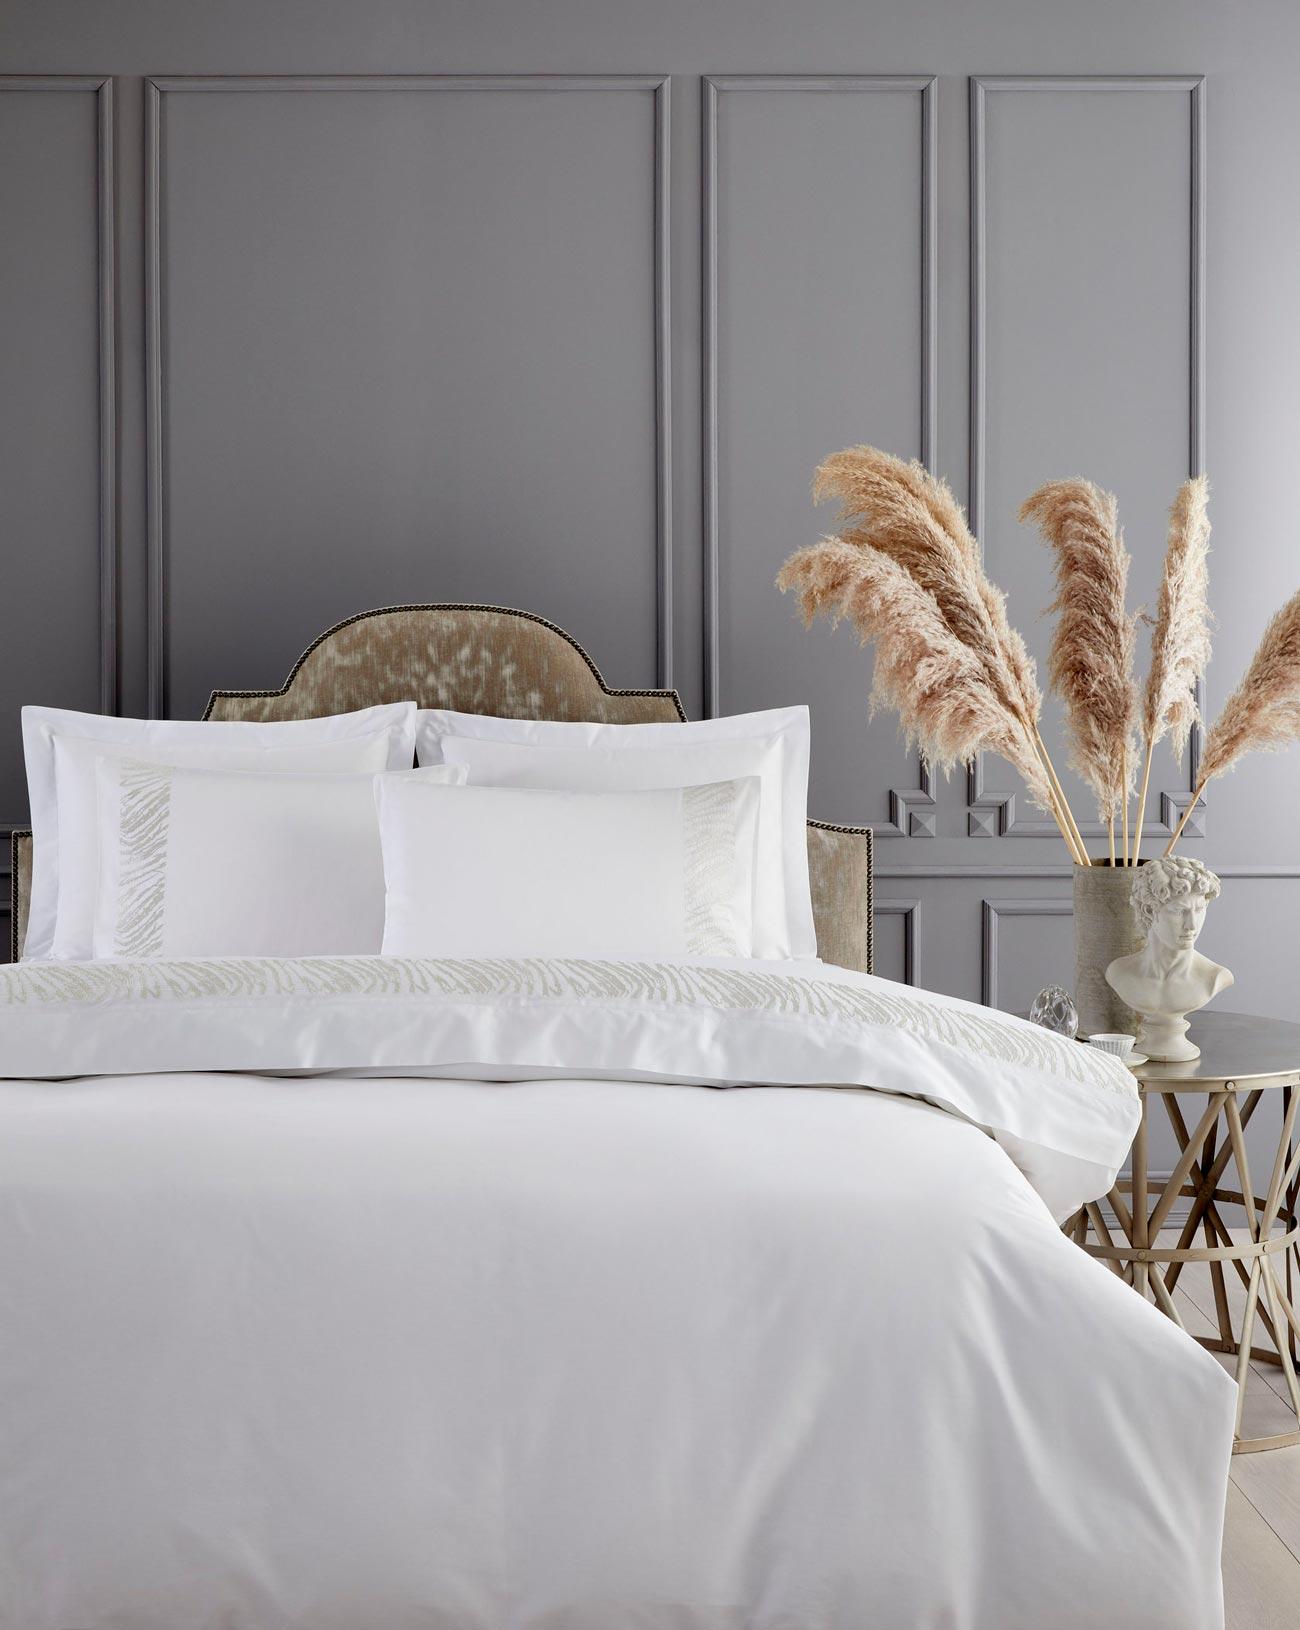 Interior-Design-Tips_5-Star-Hotel-Bedroom_authentic-interior-9